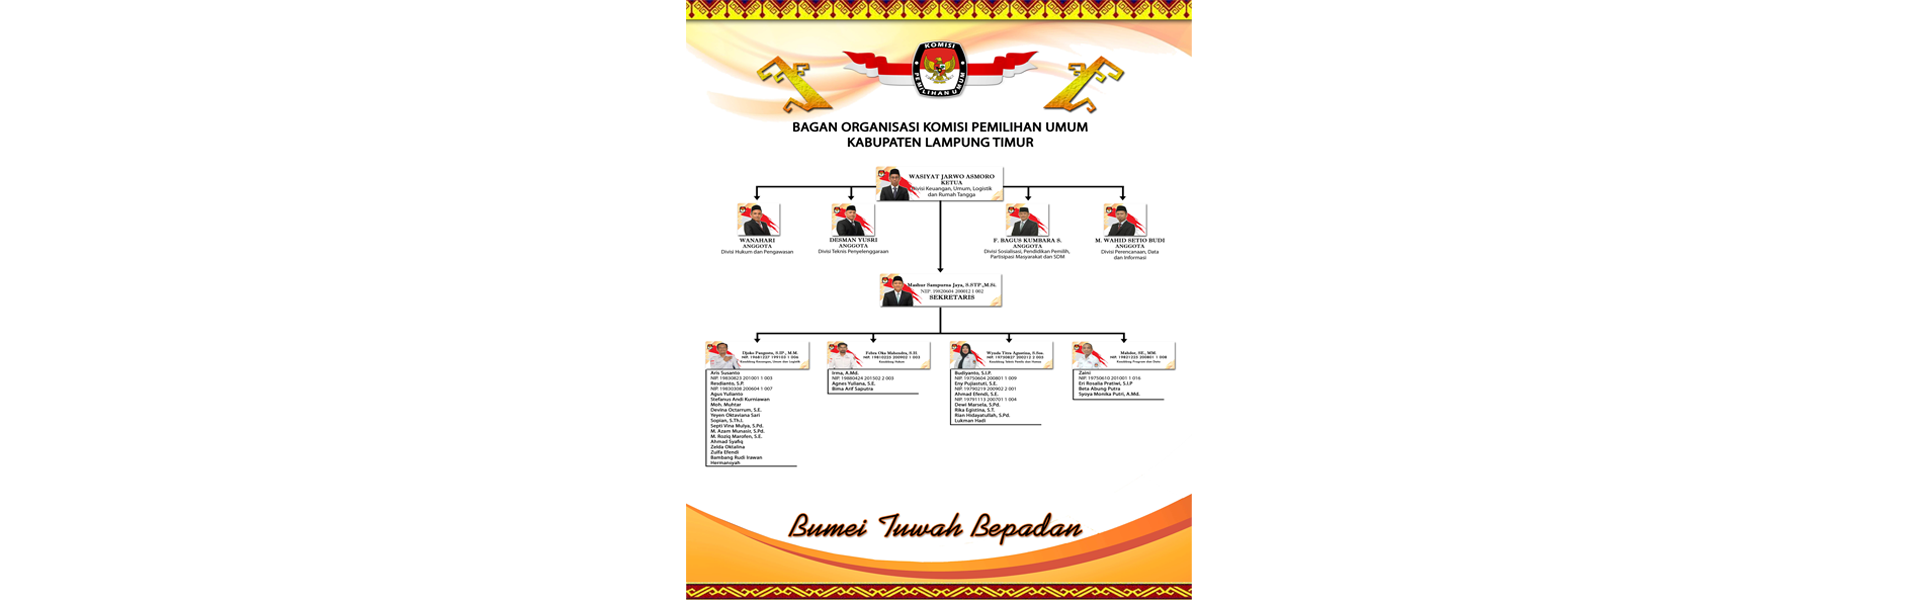 Bagan Organisasi KPU Lampung Timur